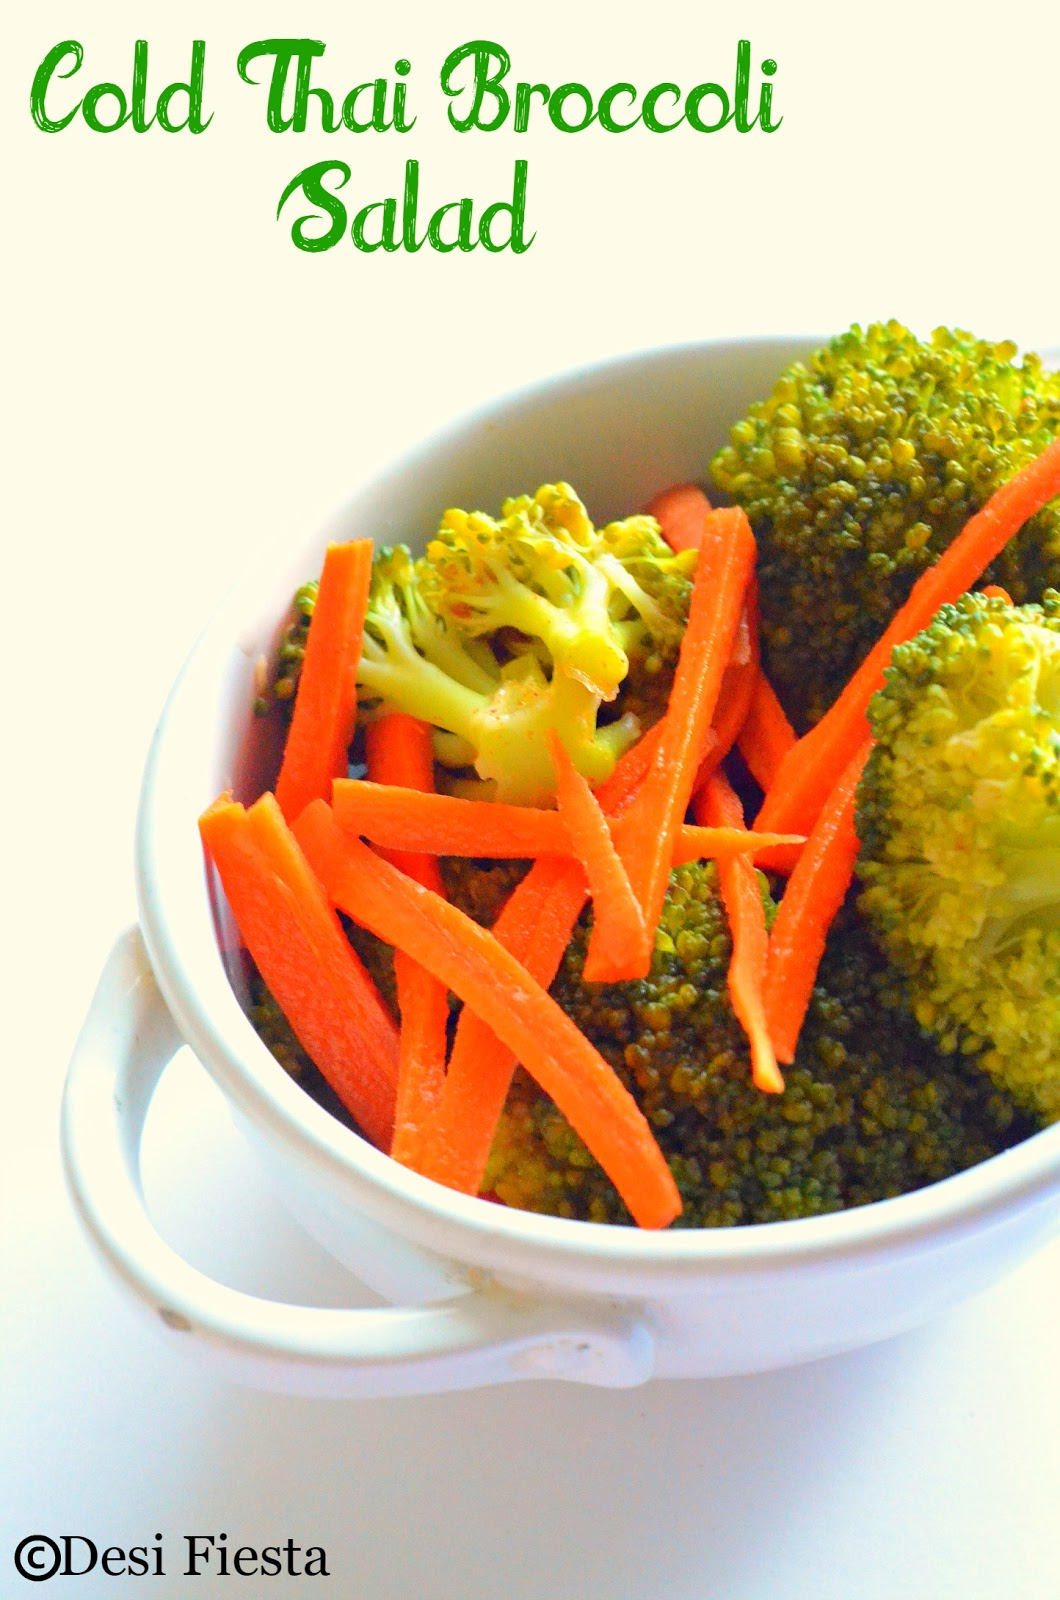 Thai broccoli salad